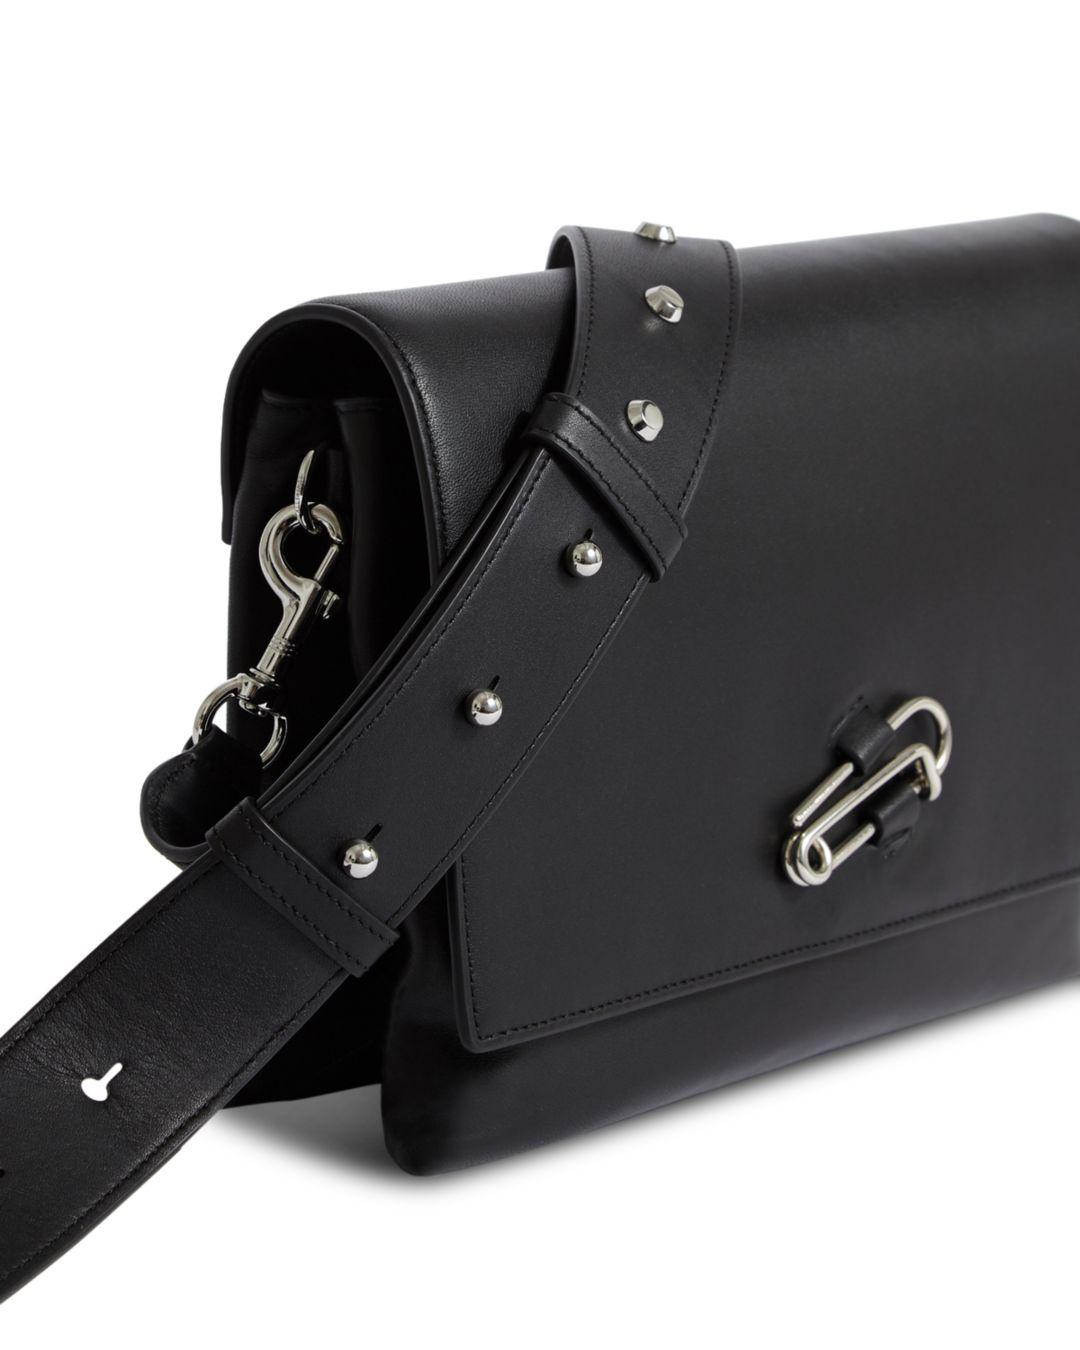 Lyst - AllSaints Nancy Large Leather Crossbody Box Bag in Black 65f1bd3cbee0f